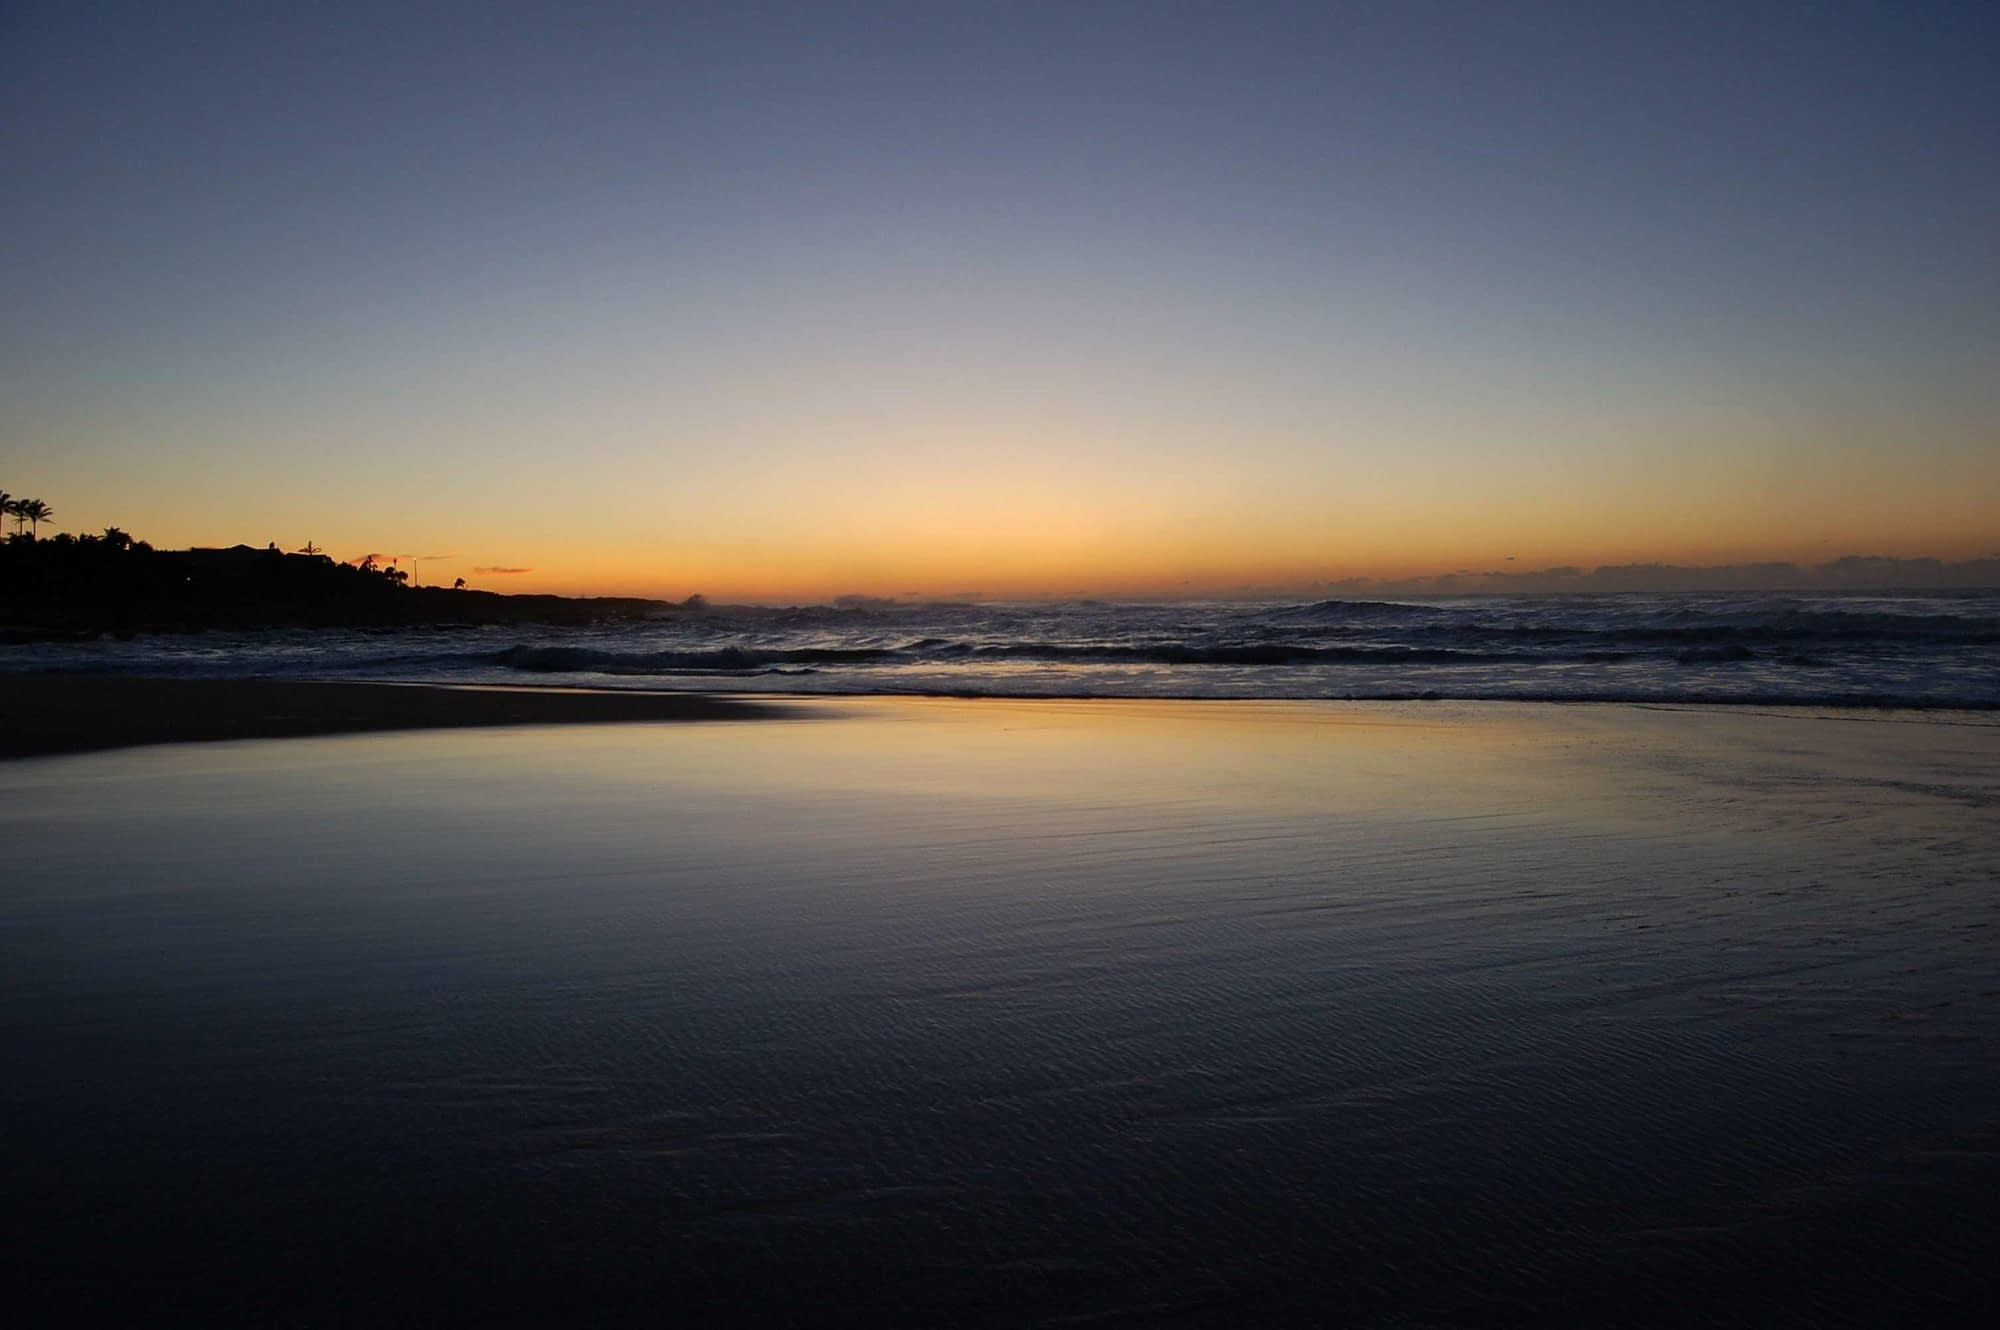 Sunrise southbroom beach south africa